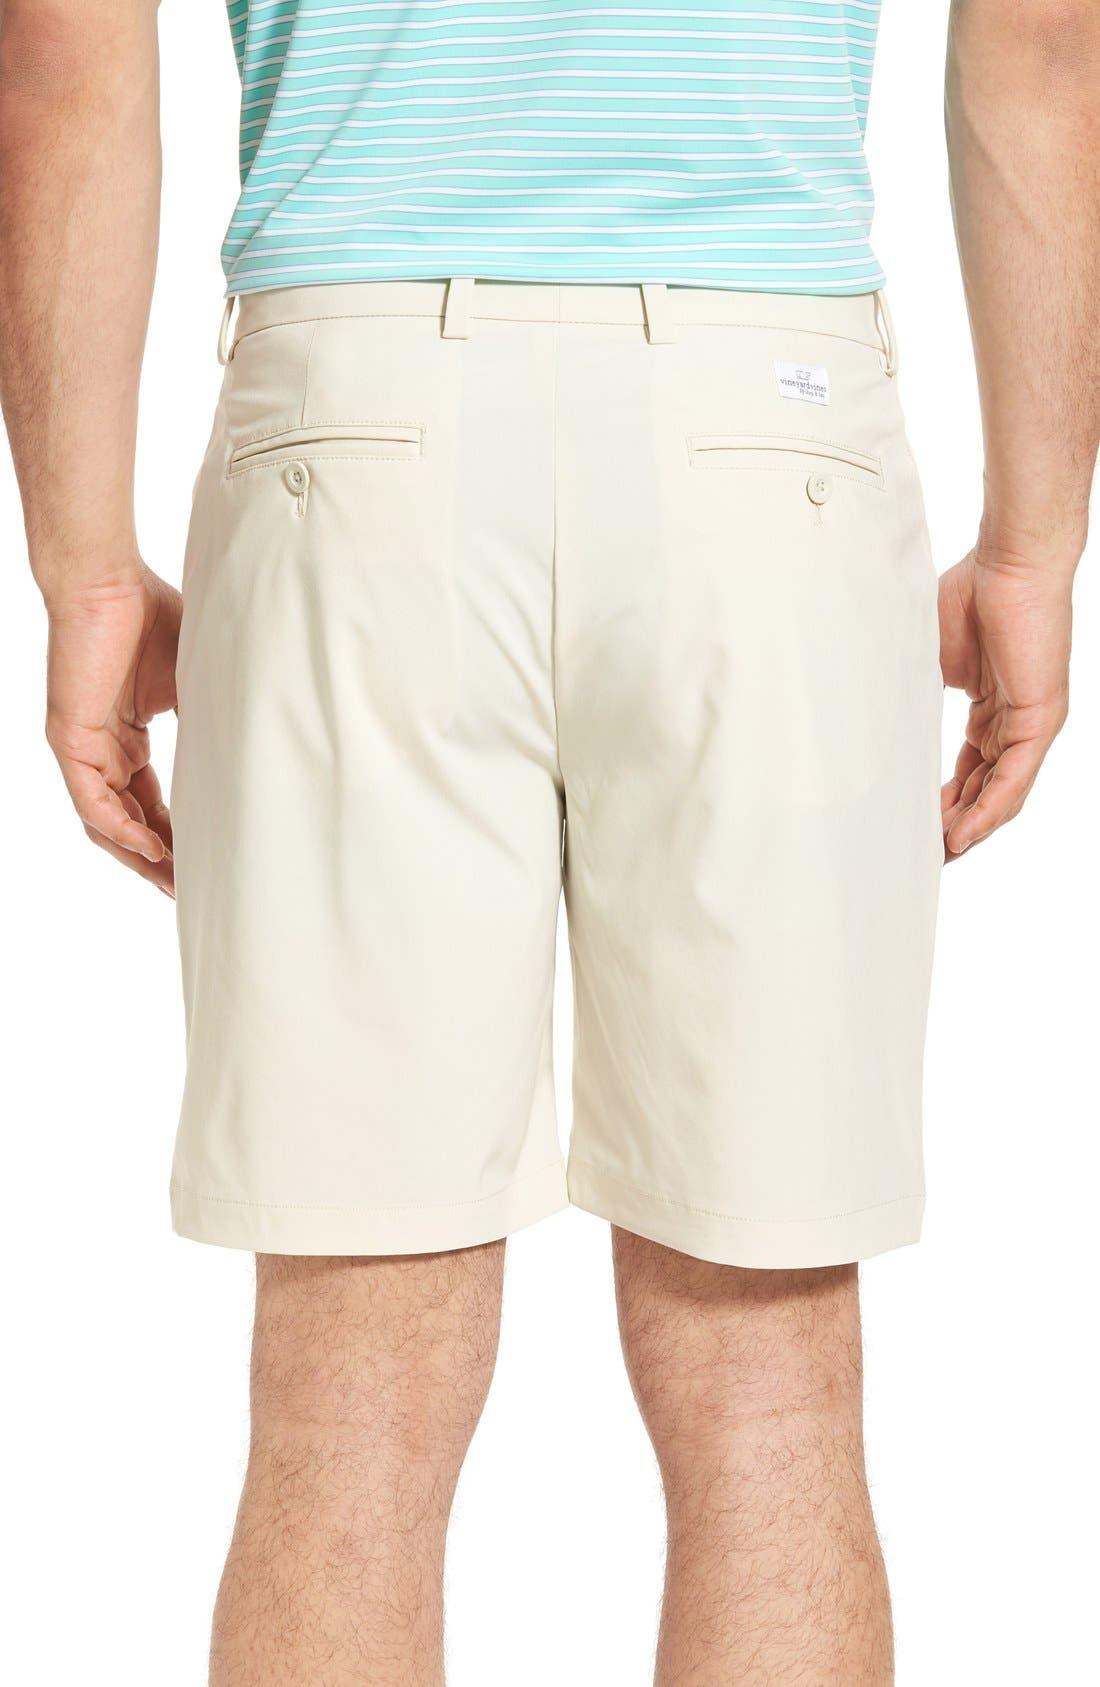 8 Inch Performance Breaker Shorts,                             Alternate thumbnail 2, color,                             Stone